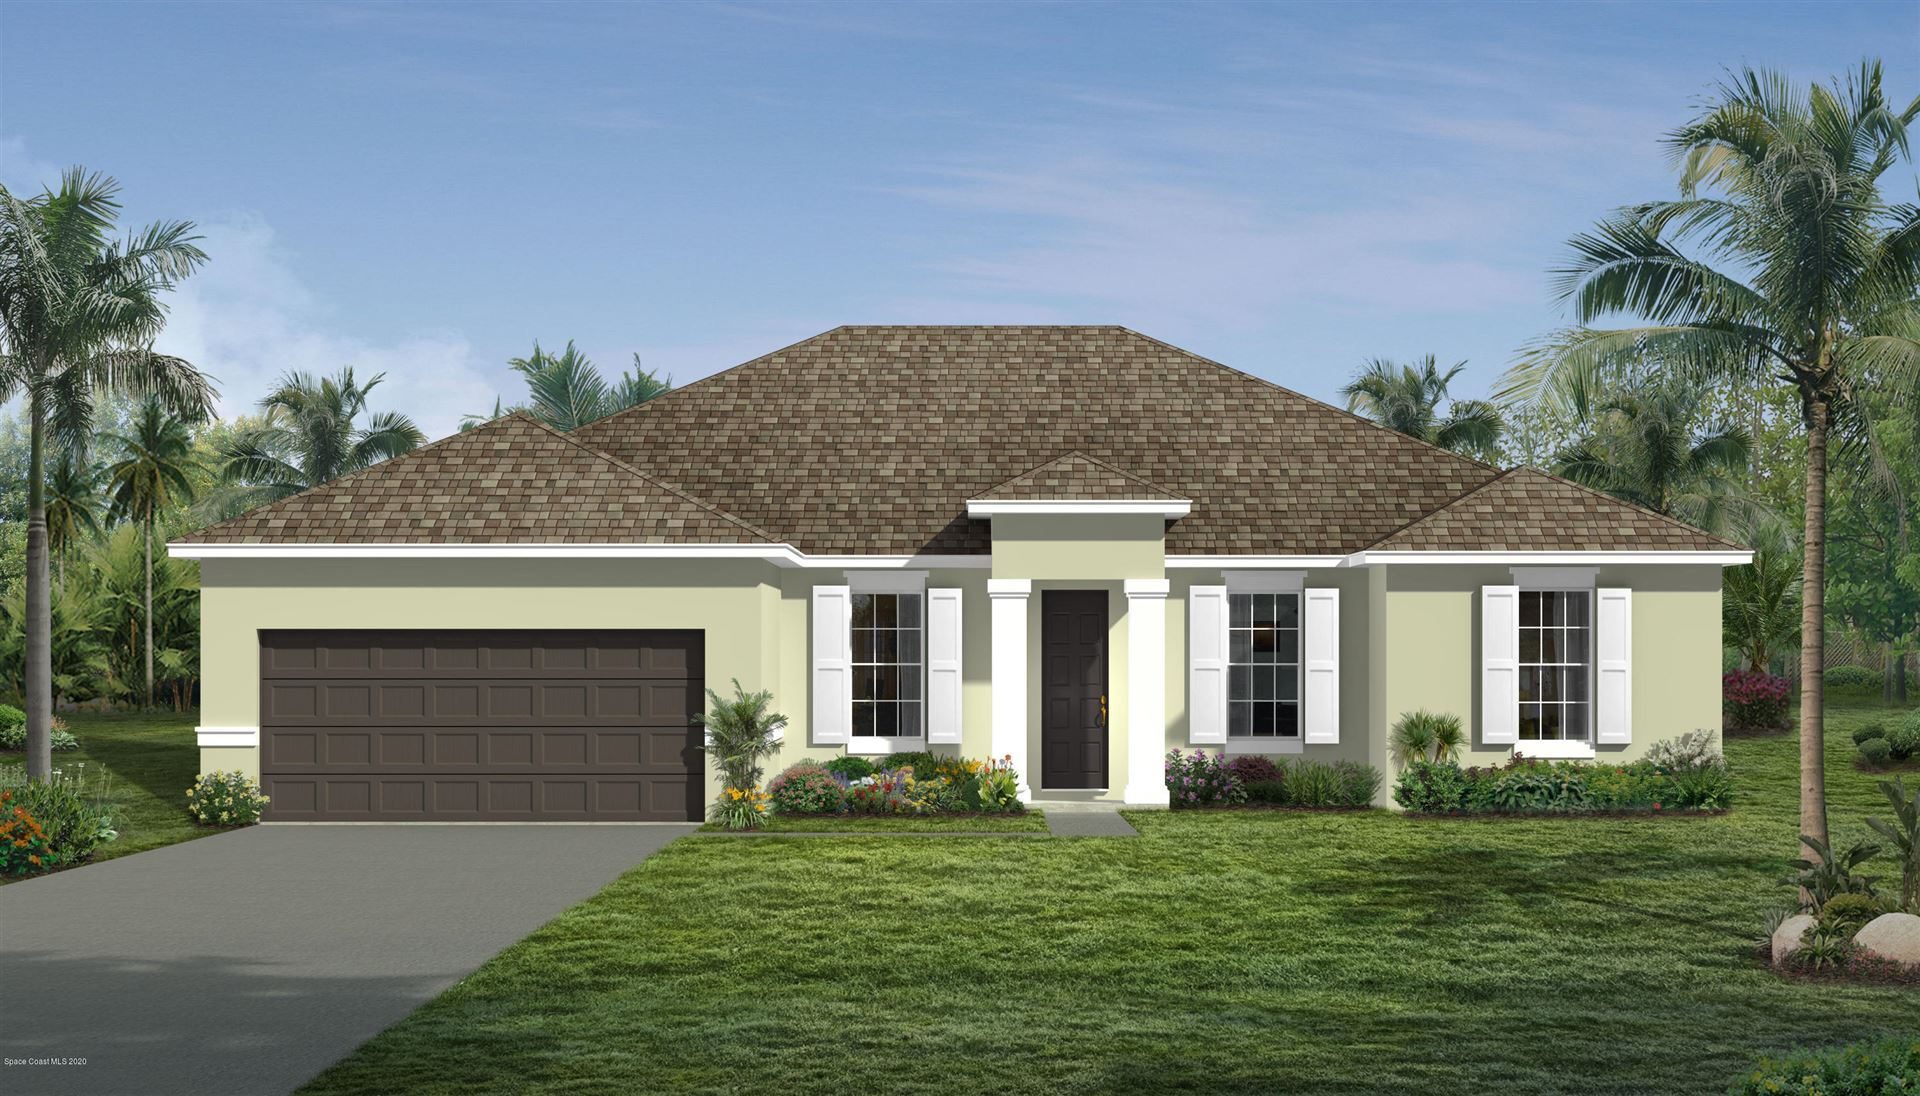 914 Serenade Street, Palm Bay, FL 32907 - #: 916396